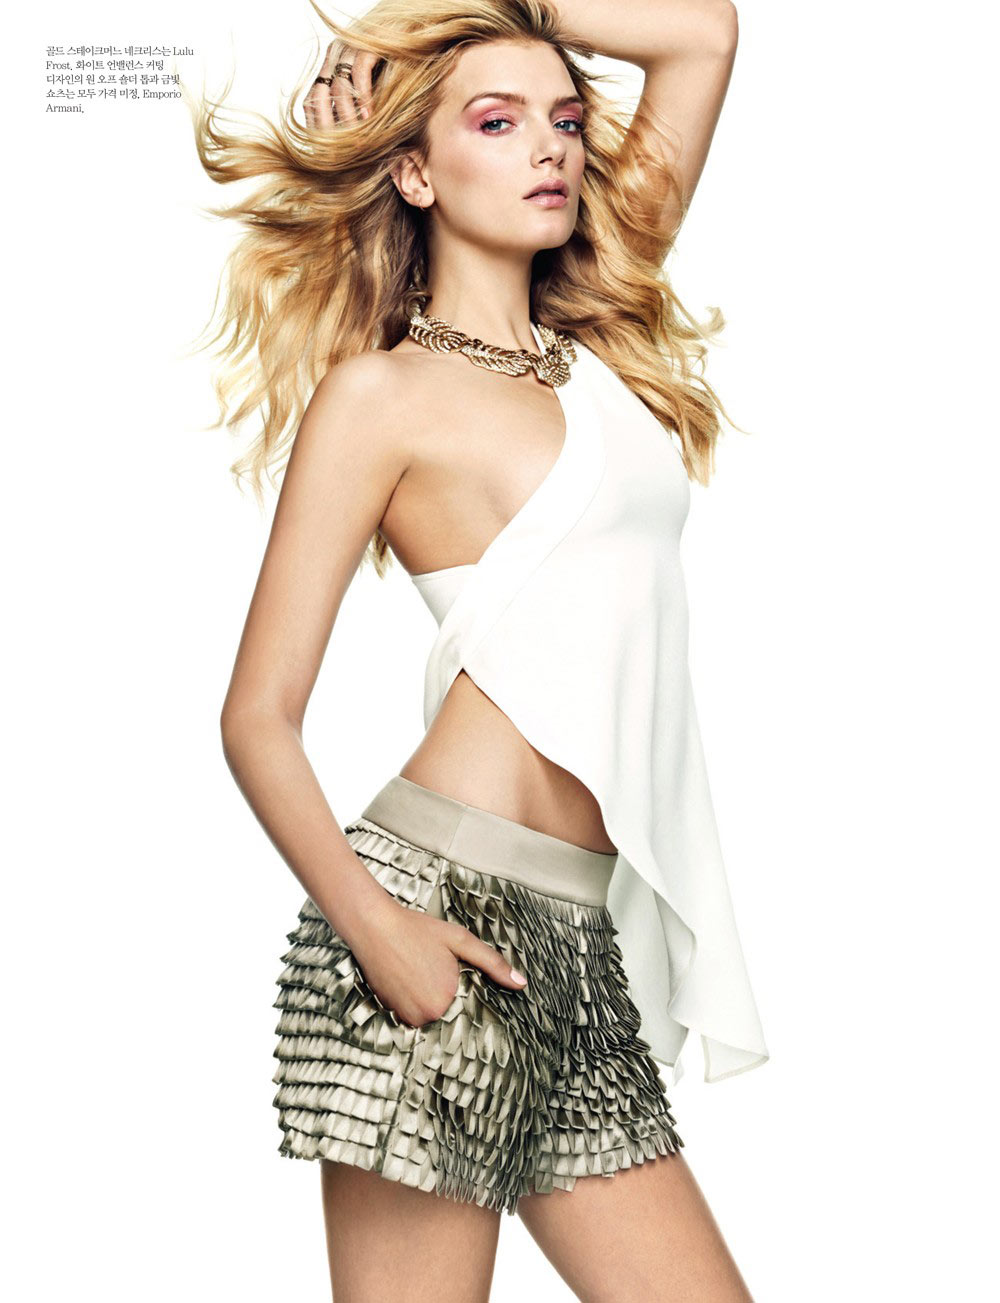 Lily Donaldson Rocks Emporio Armani for Elle Korea's April 2013 Cover Story